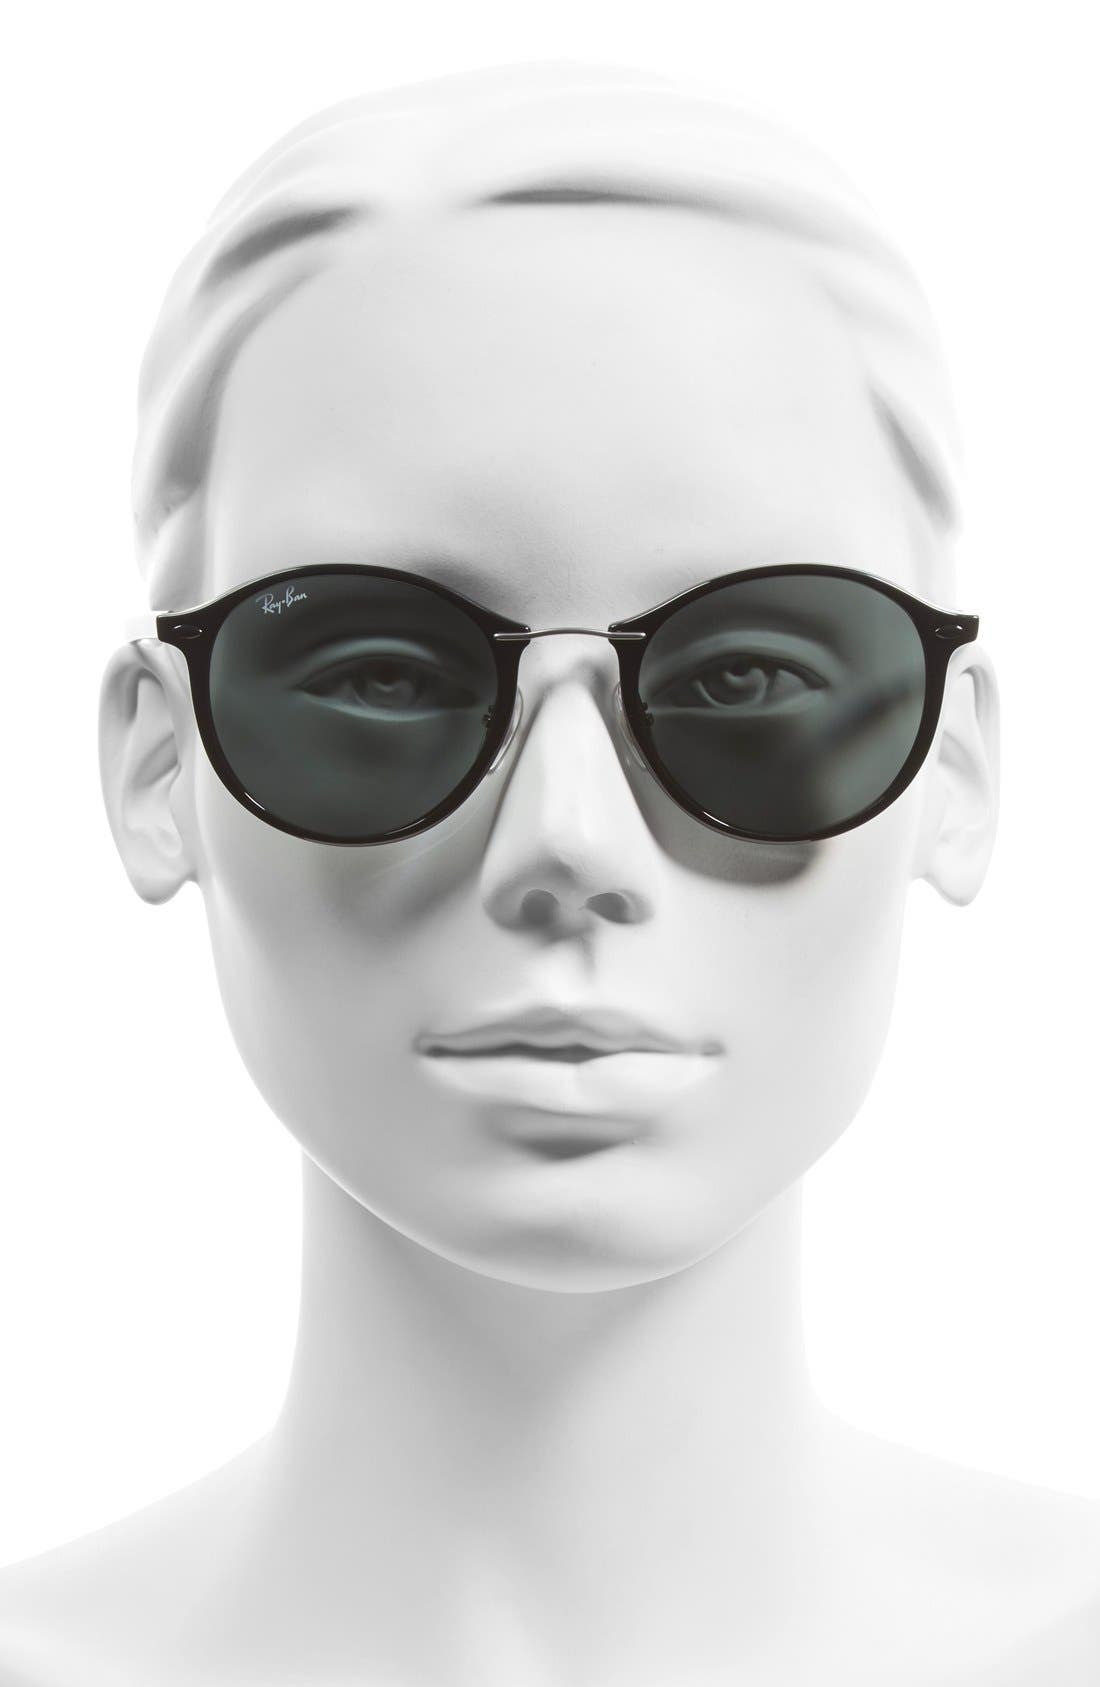 49mm Round Sunglasses,                             Alternate thumbnail 2, color,                             001